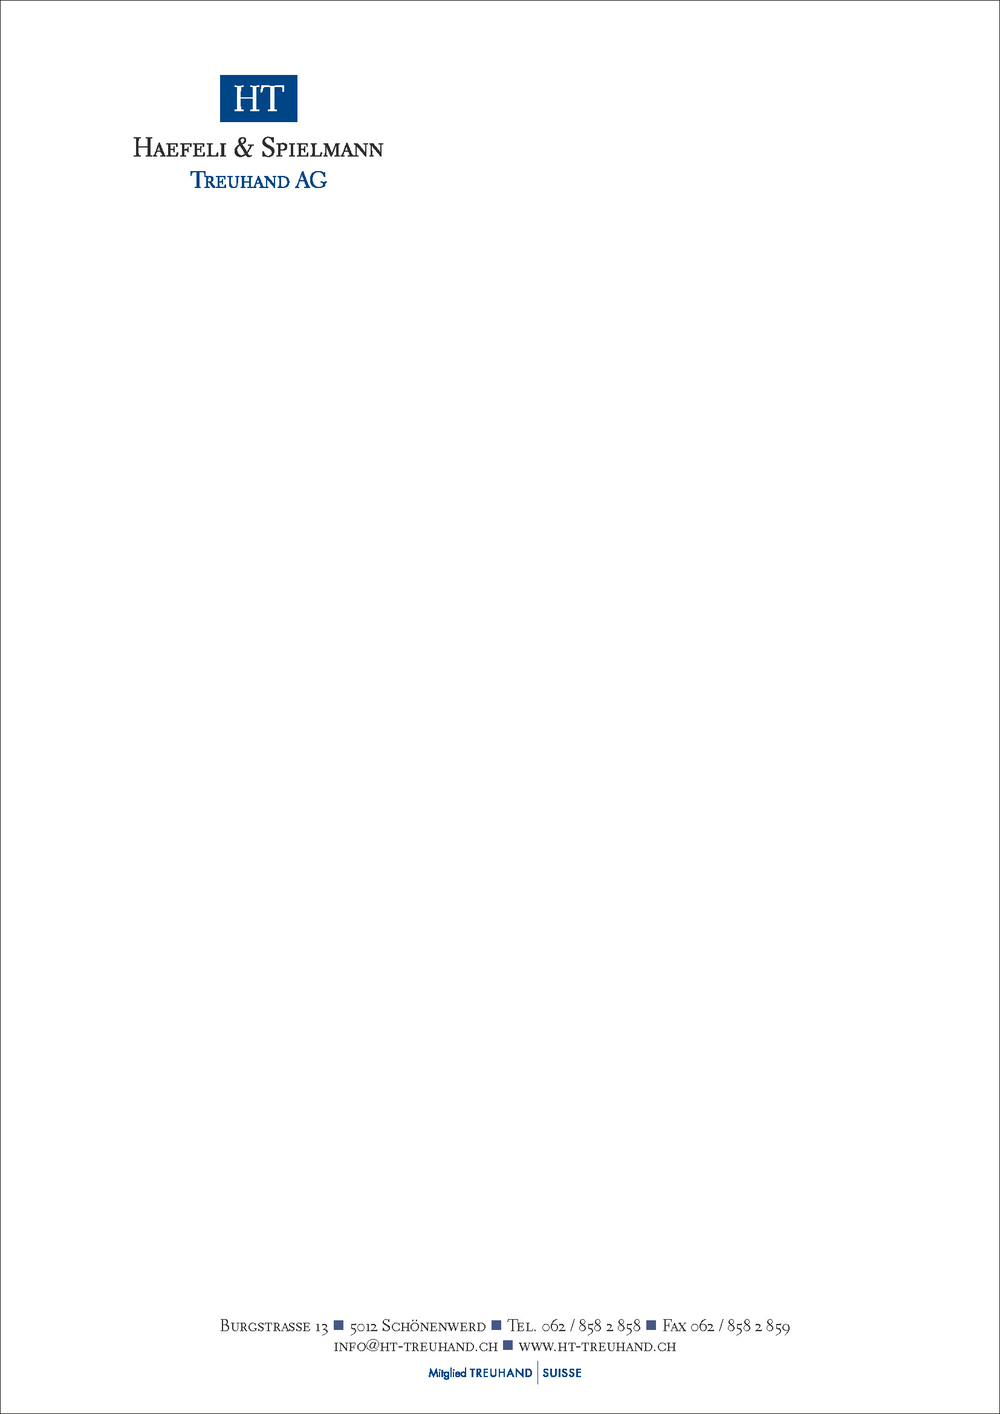 Die Papeterie (A4-Briefpapier)